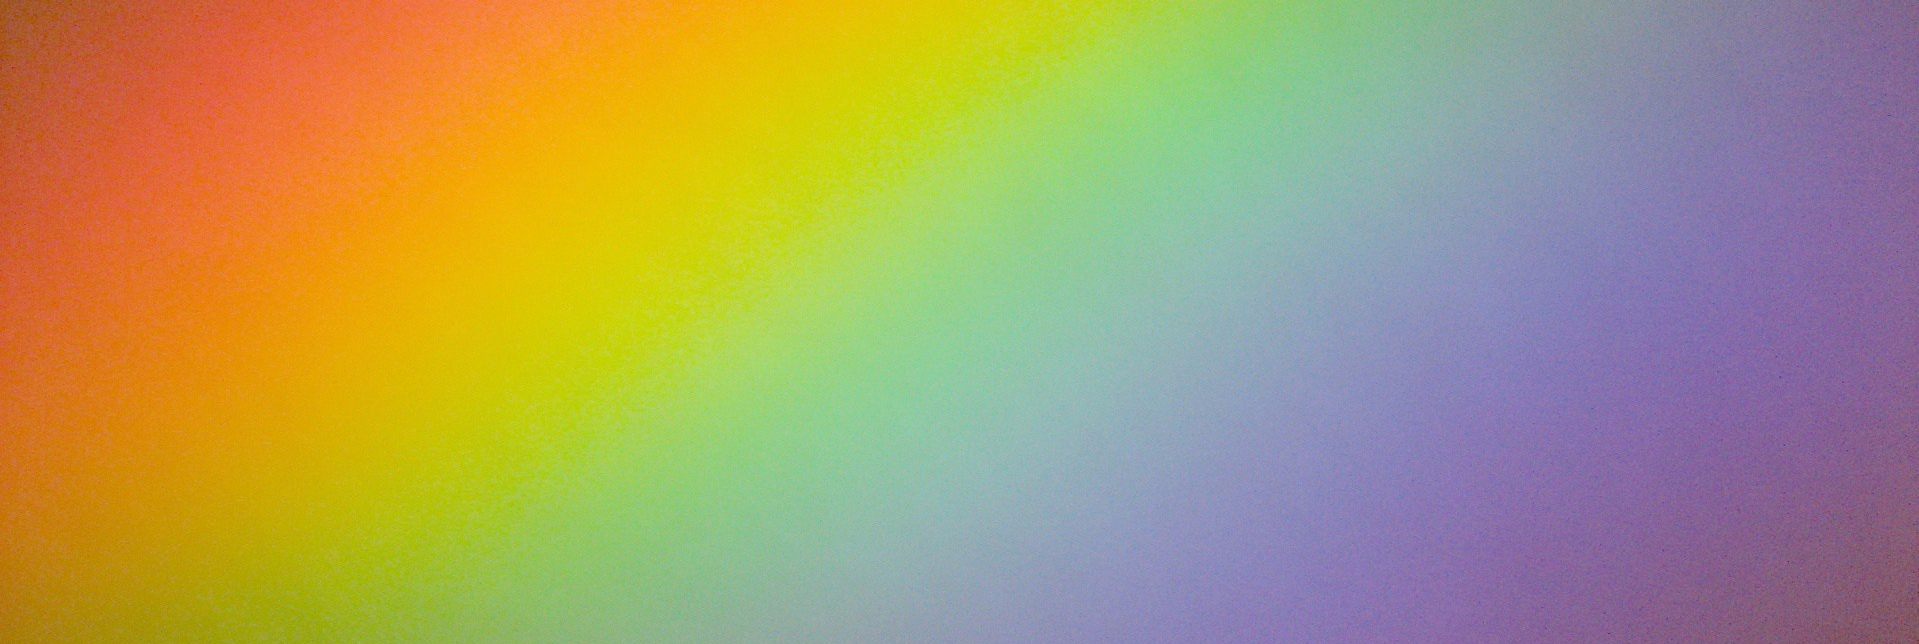 rainbow-11.jpg